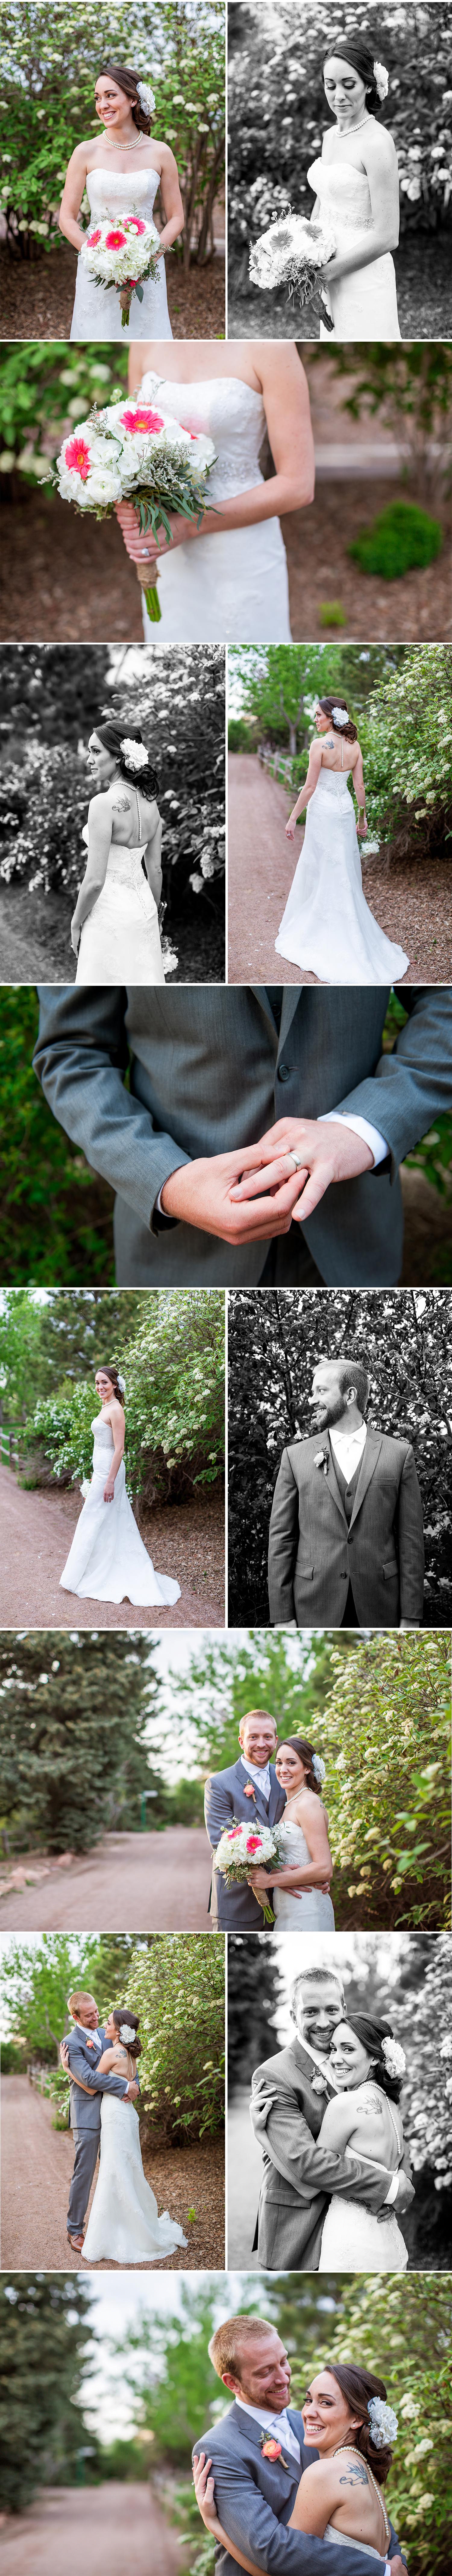 8_Spring Wedding Venue Denver.jpg